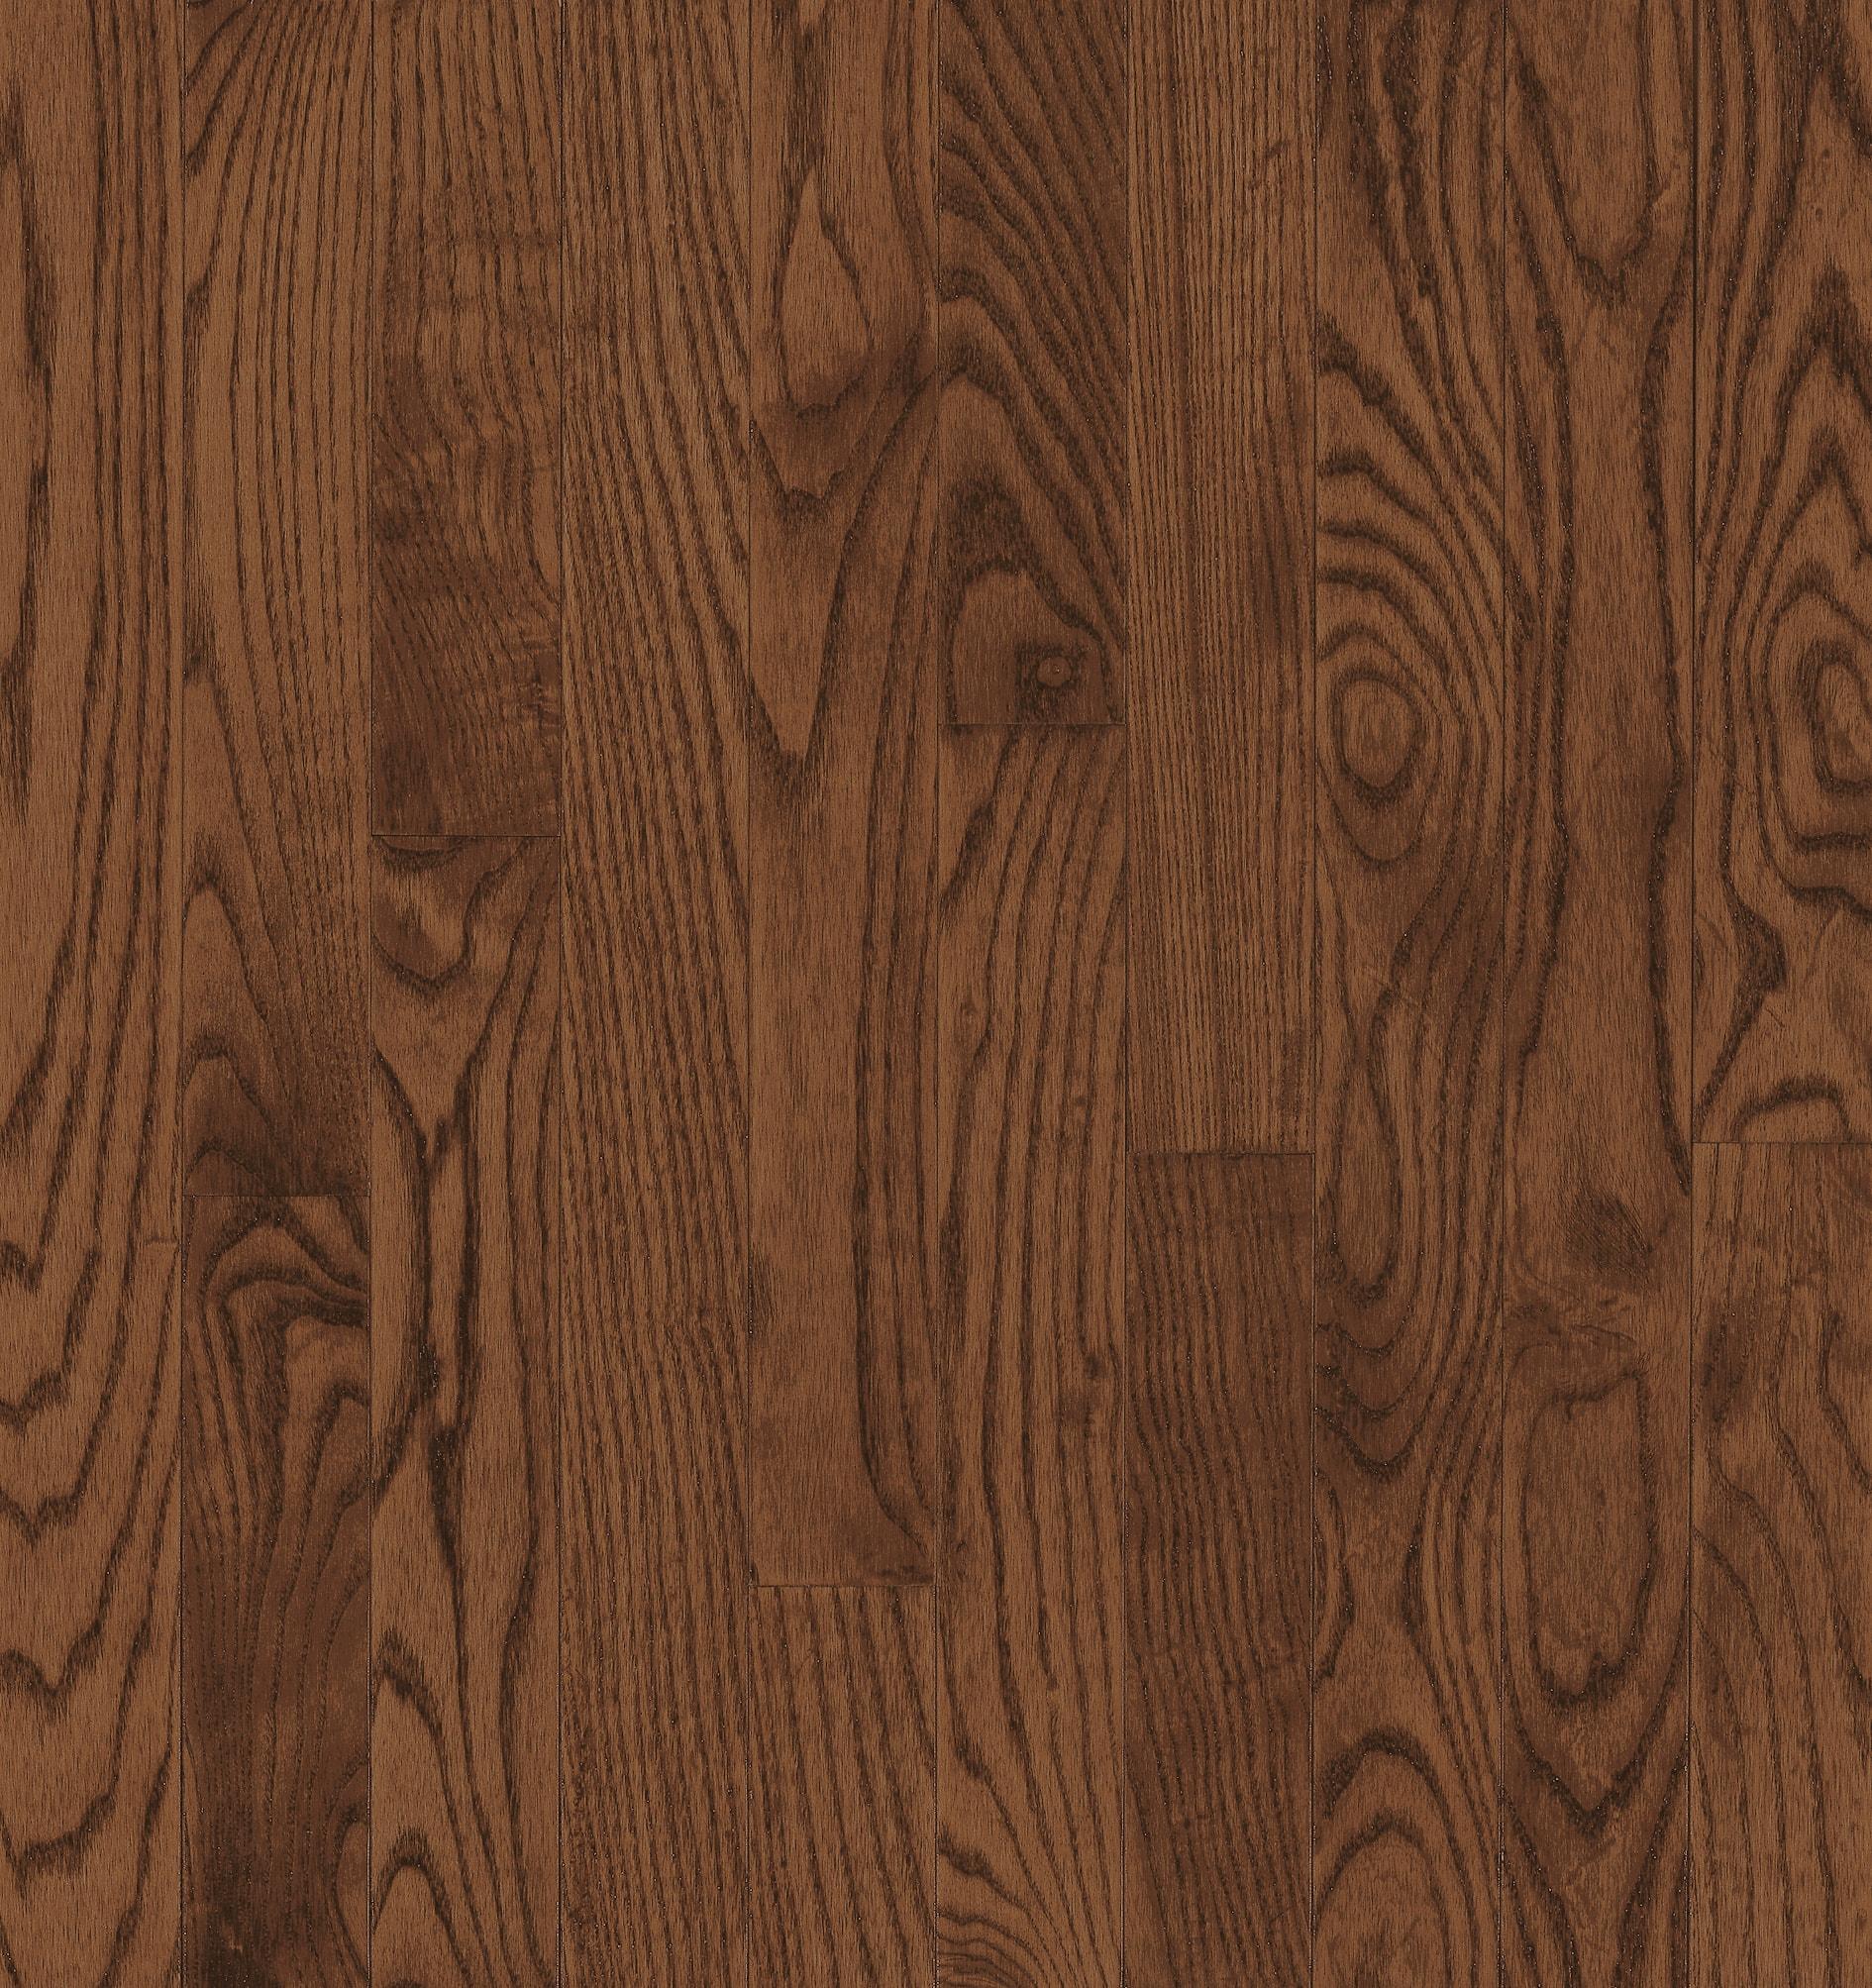 Saddle hardwood floor